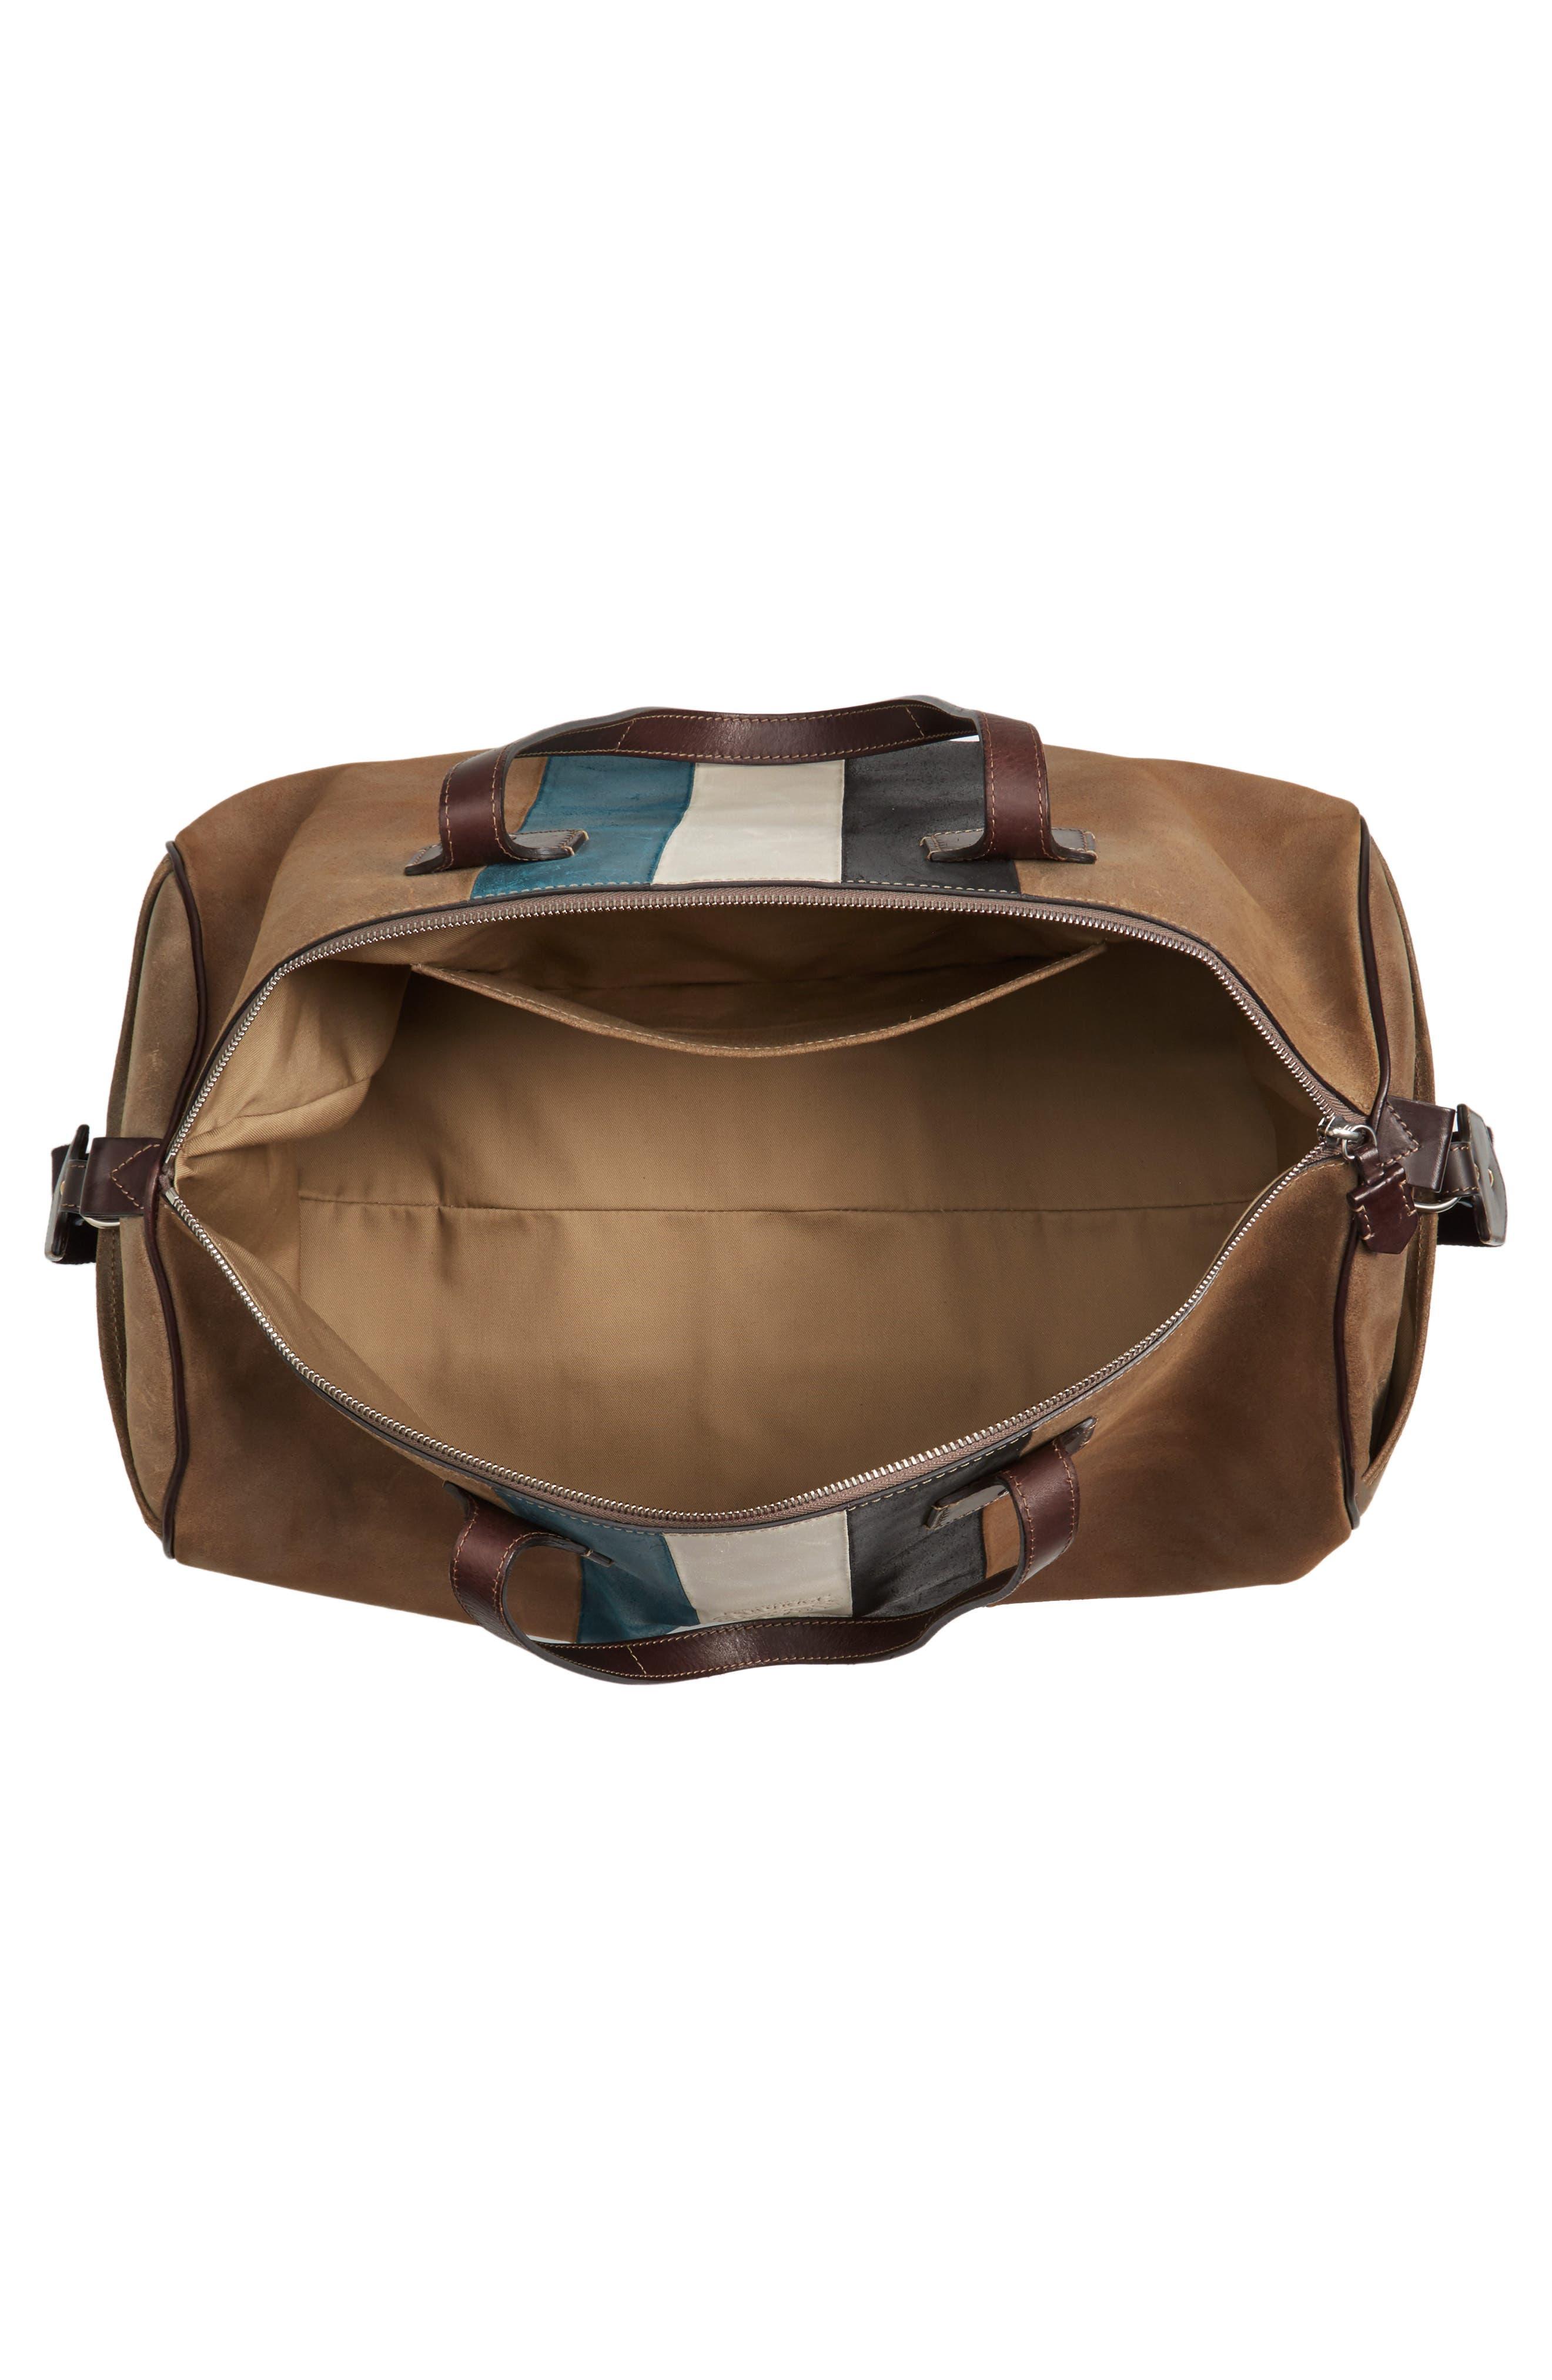 Grove Stripe Leather Duffel Bag,                             Alternate thumbnail 3, color,                             250